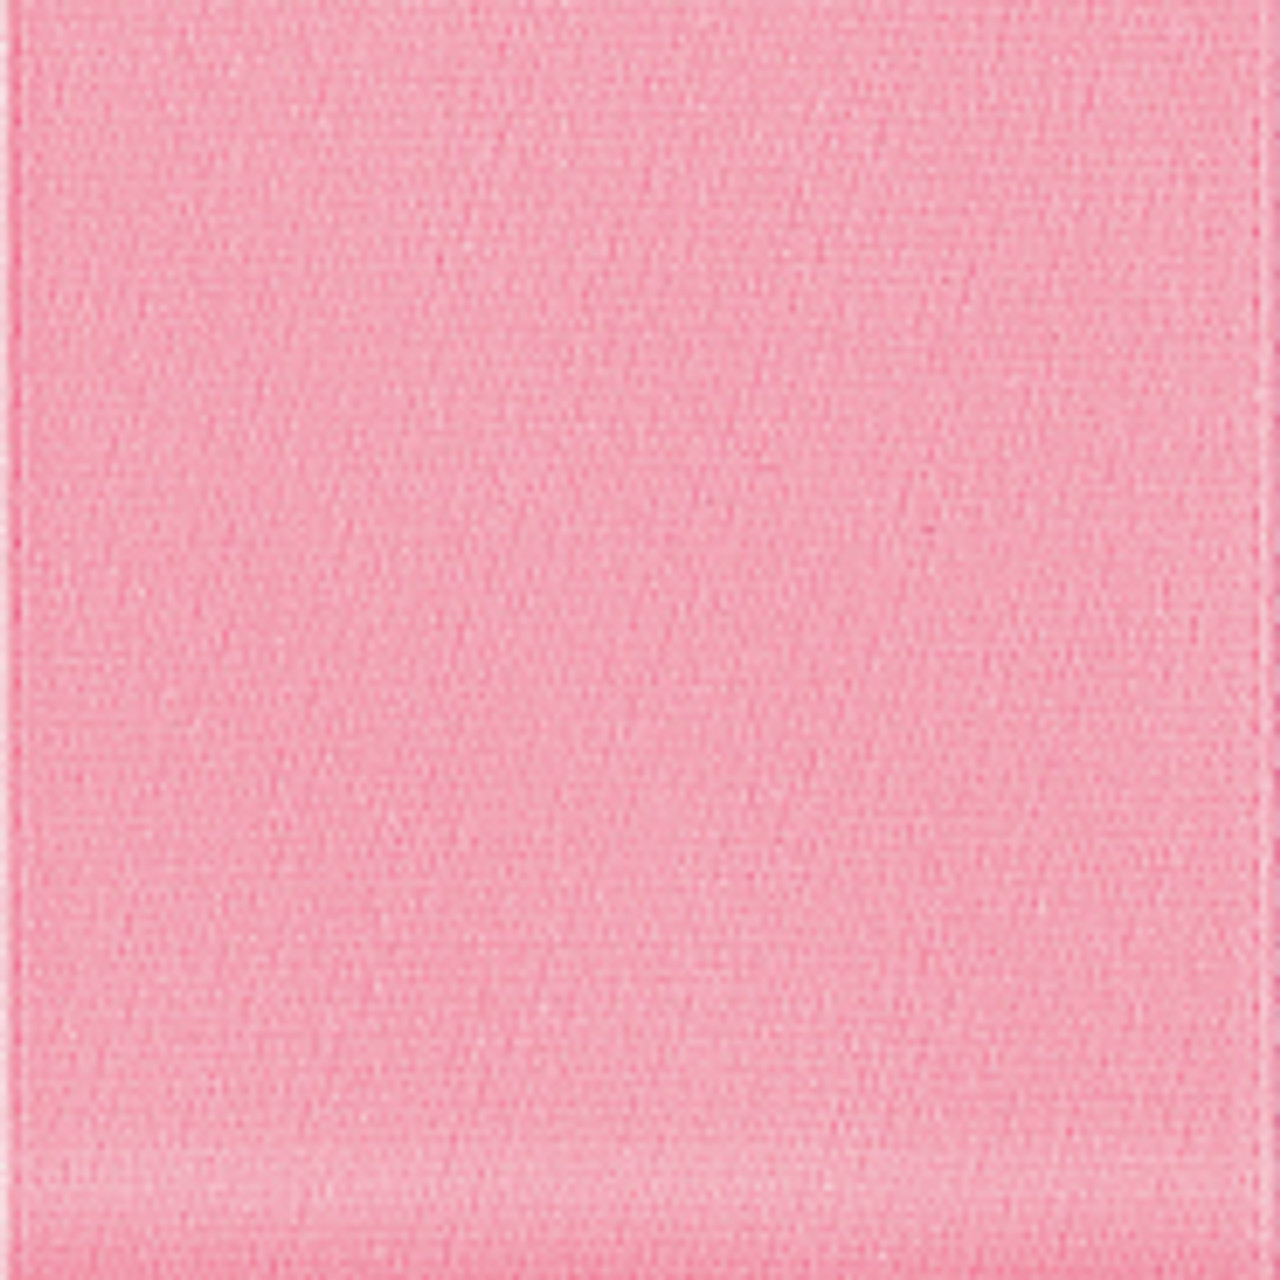 Offray Pink Single Faced Satin Ribbon.